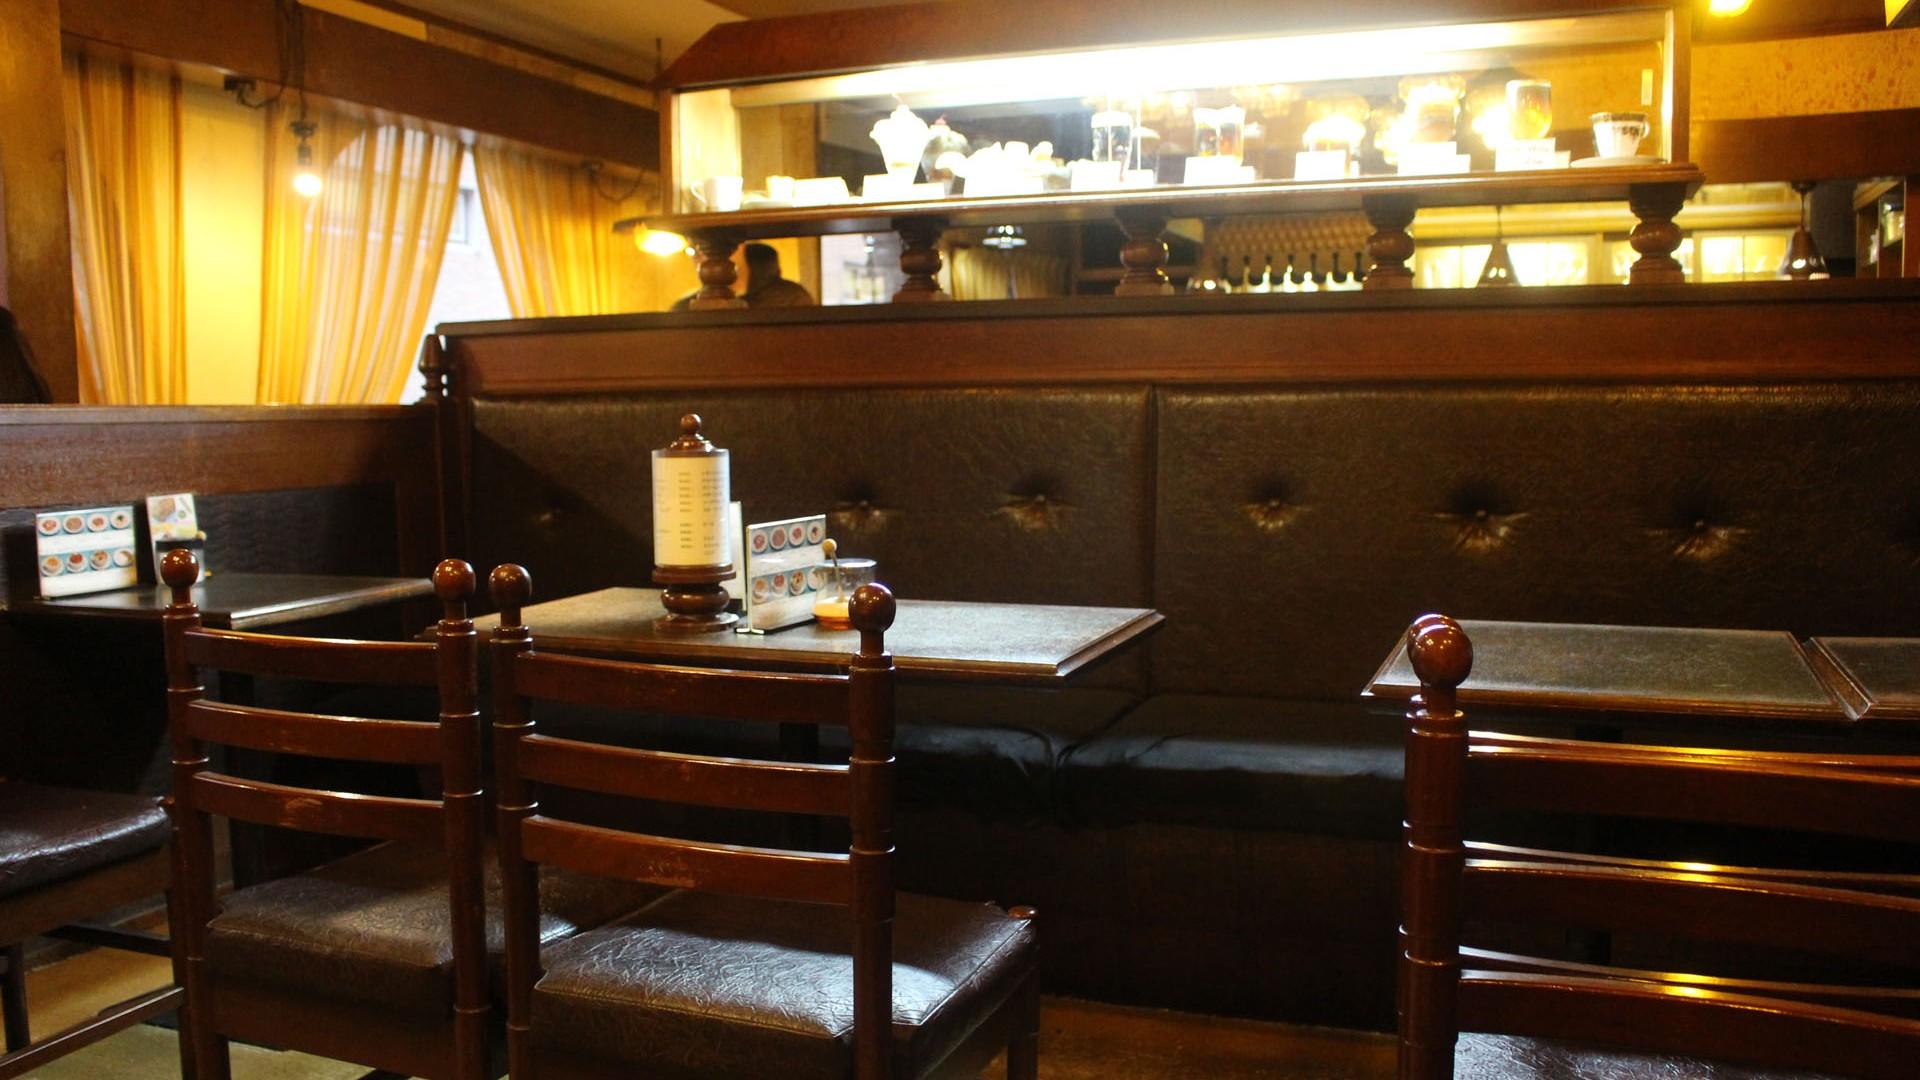 Fujisawa Feines Essen, Café Julian